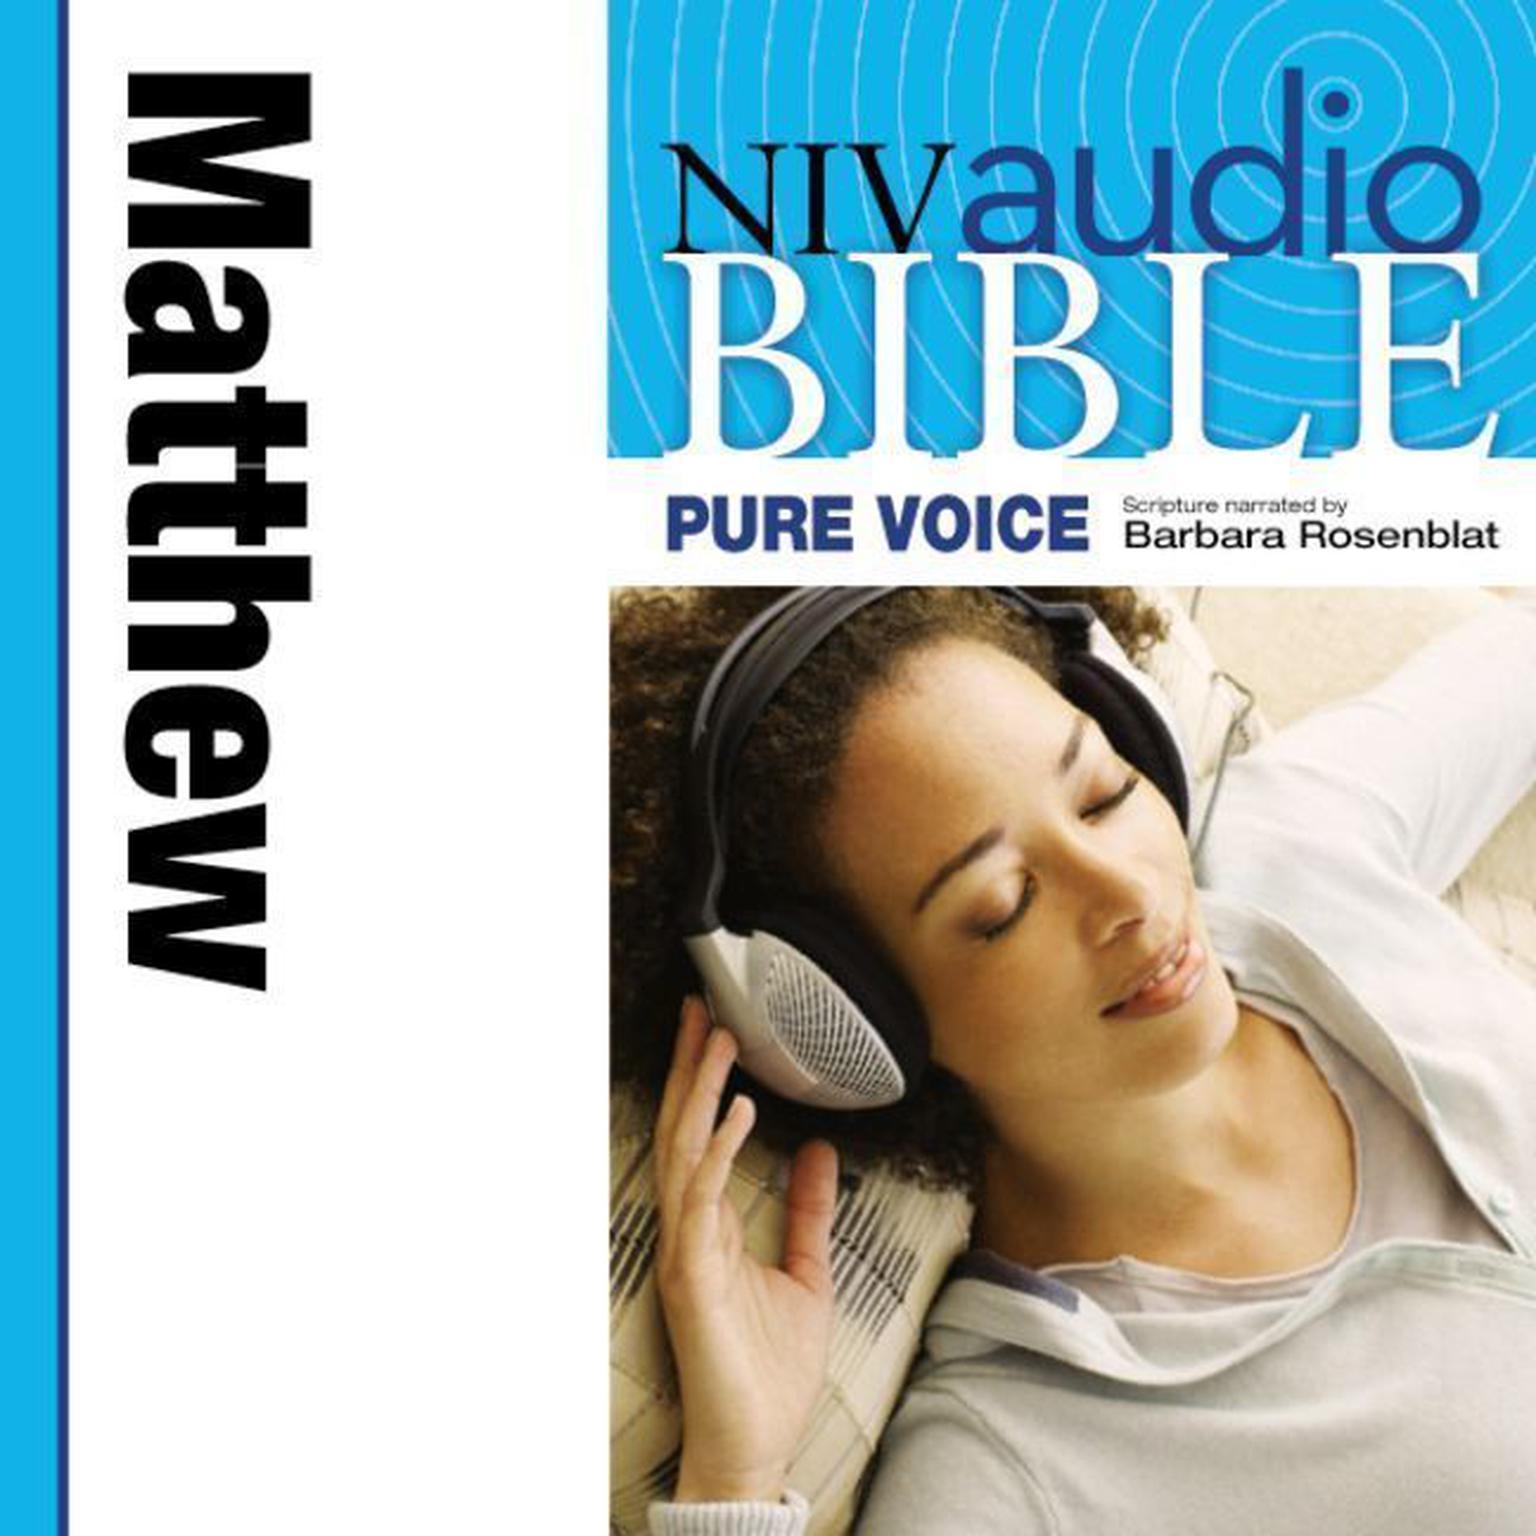 Printable Pure Voice Audio Bible - New International Version, NIV (Narrated by Barbara Rosenblat): (01) Matthew Audiobook Cover Art